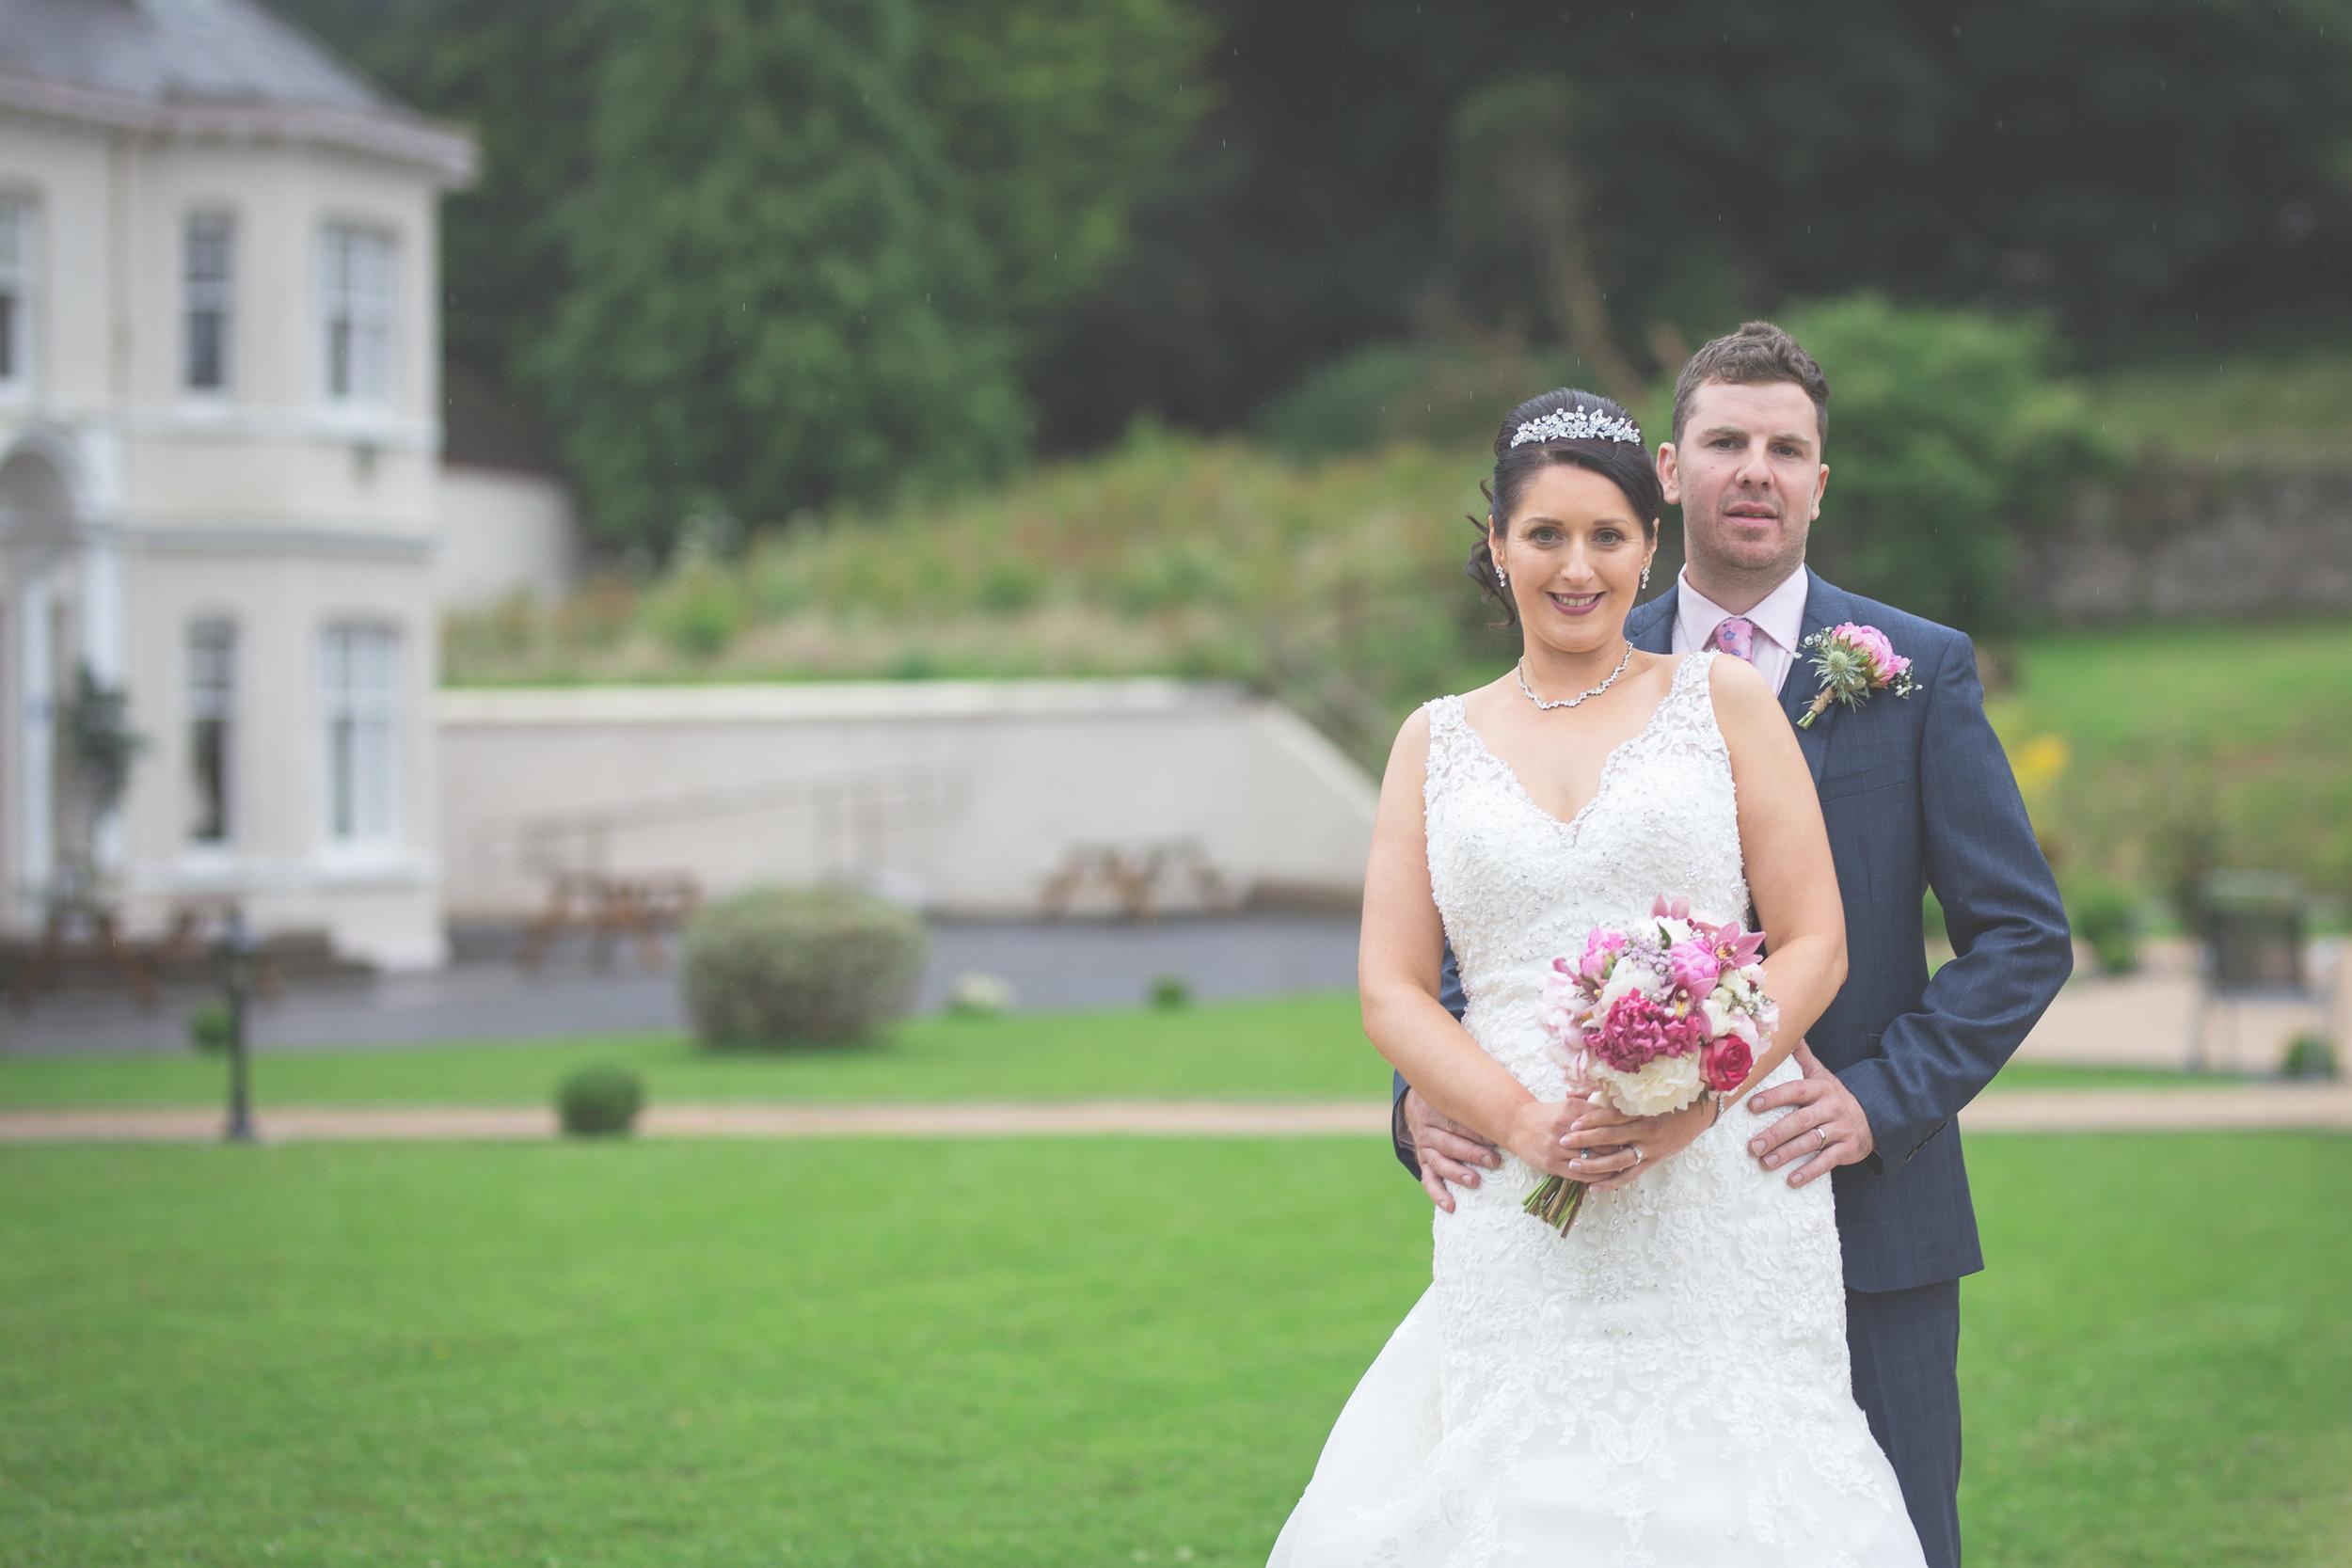 Northern Ireland Wedding Photographer | Brian McEwan | Louise & Darren-292.jpg